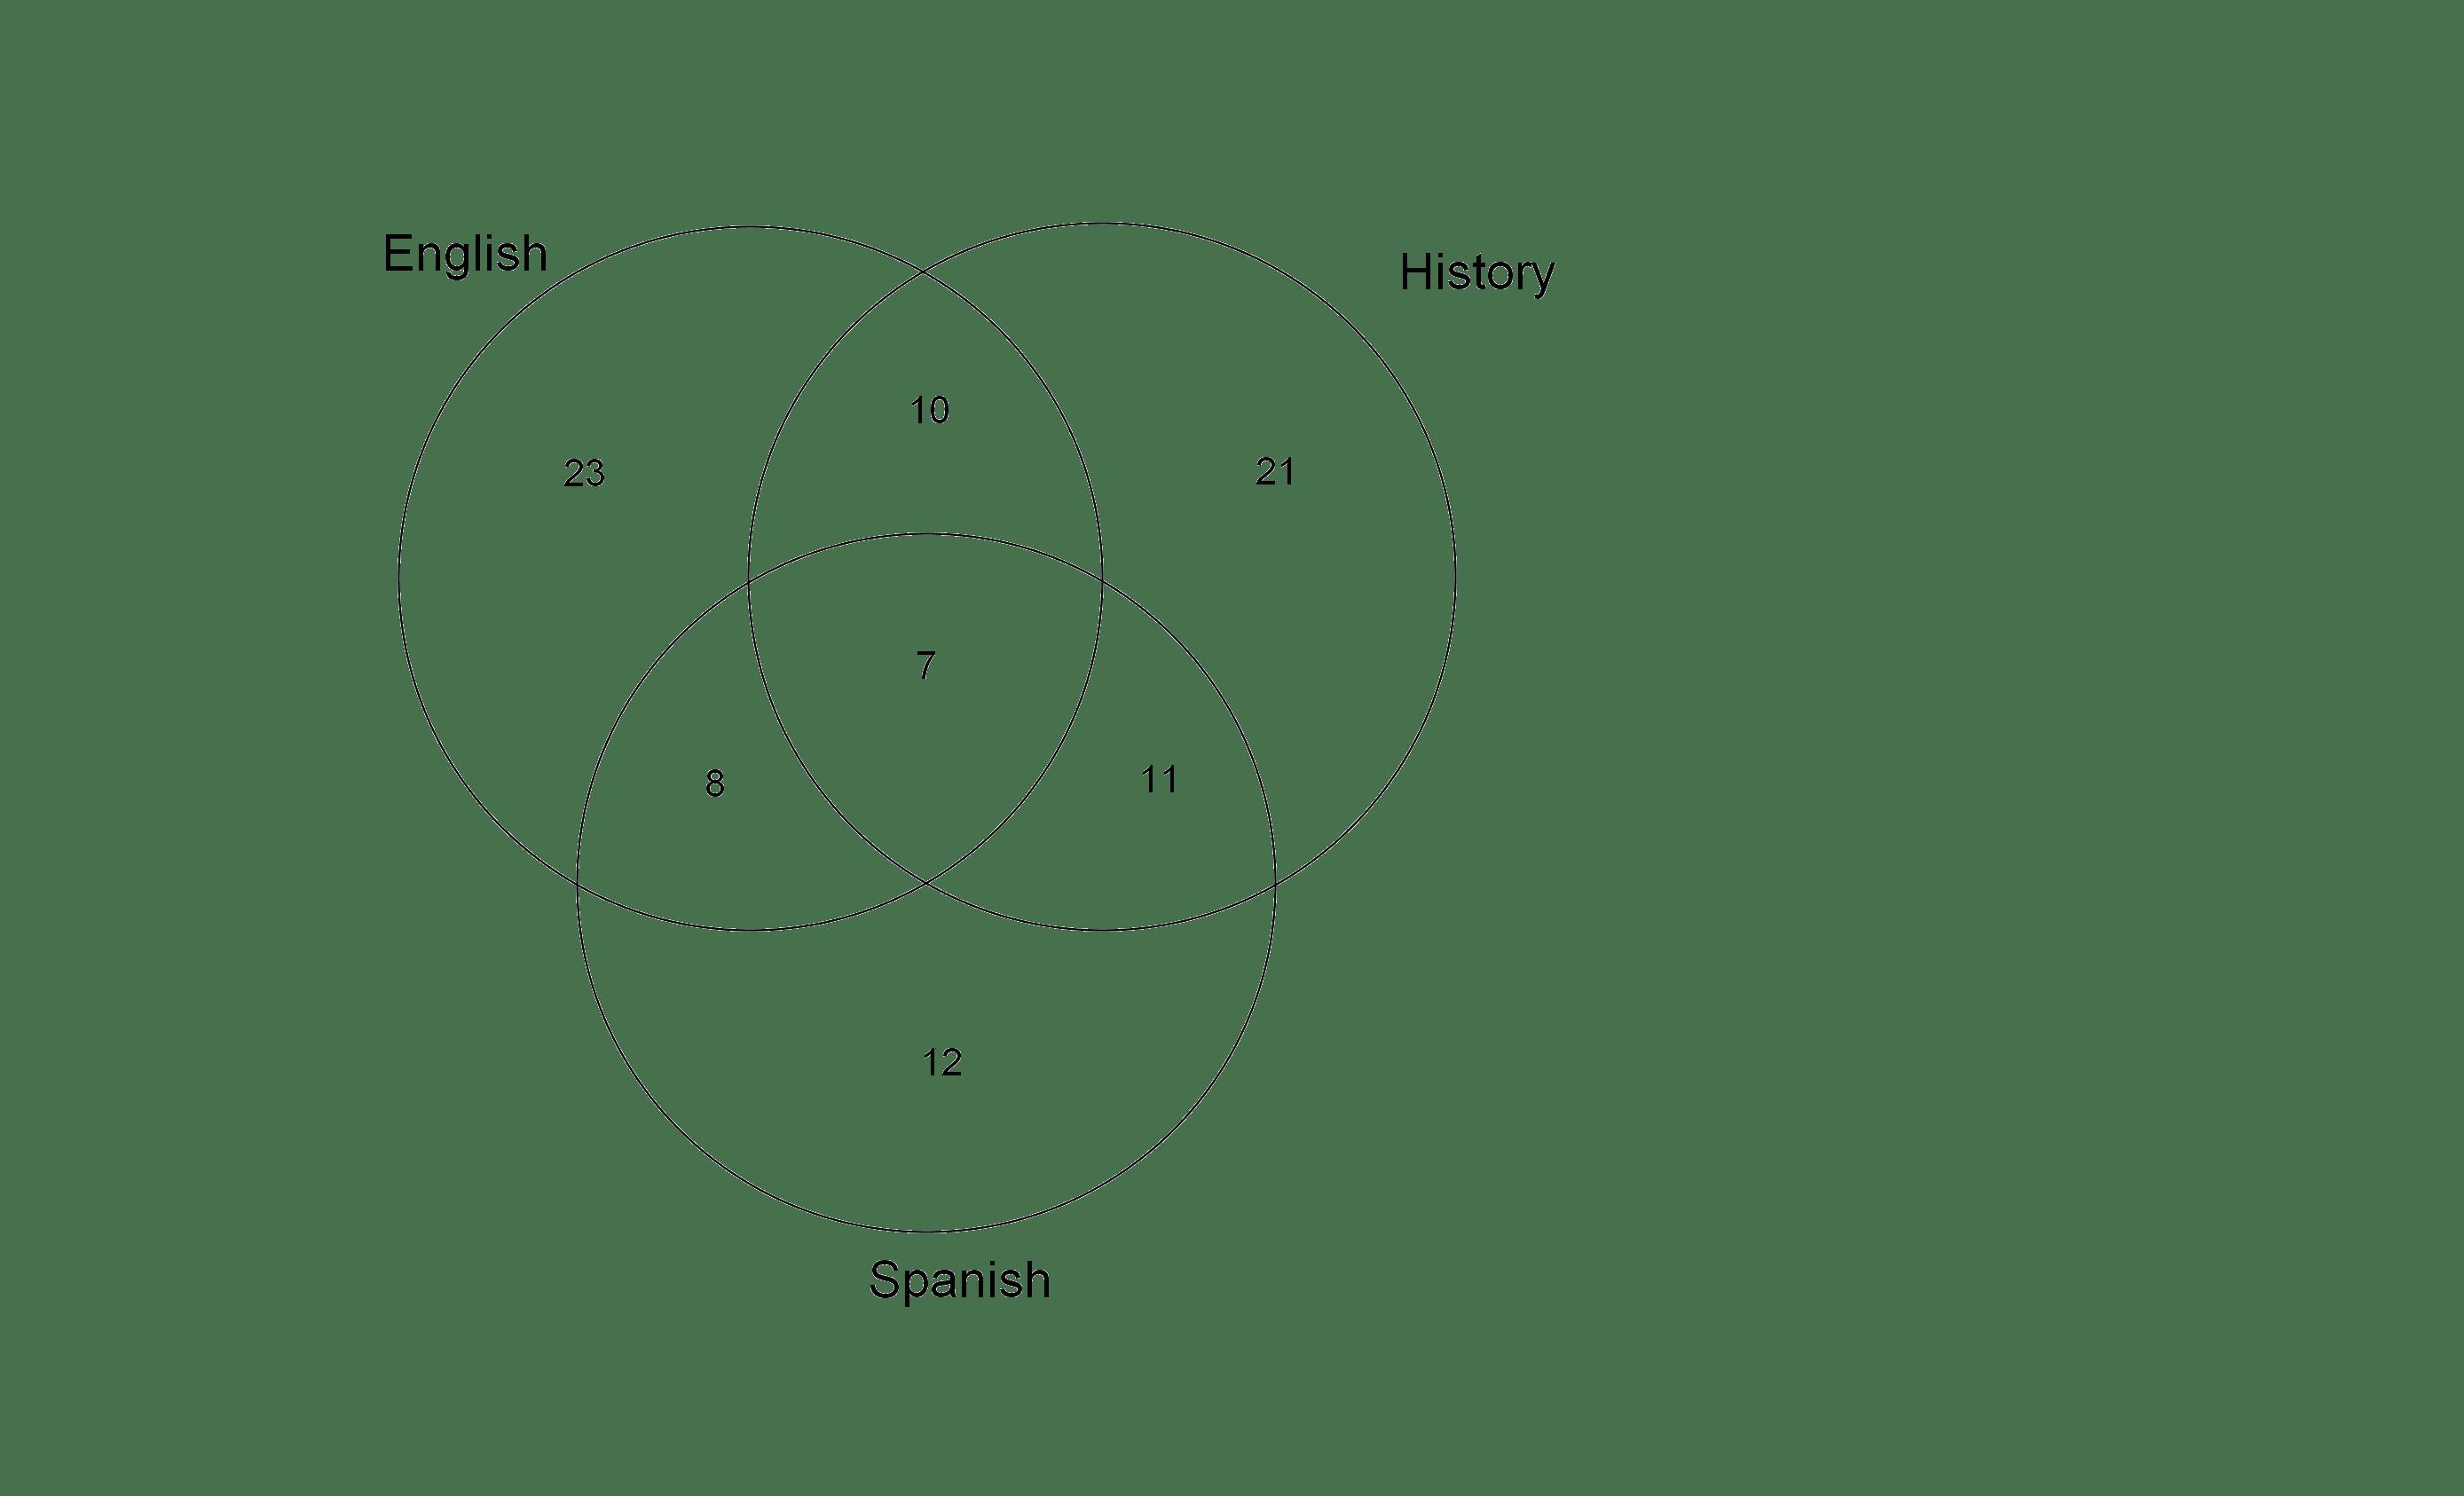 blank venn diagram word document 208 to 24 volt transformer wiring printable diagrams 2 circle template